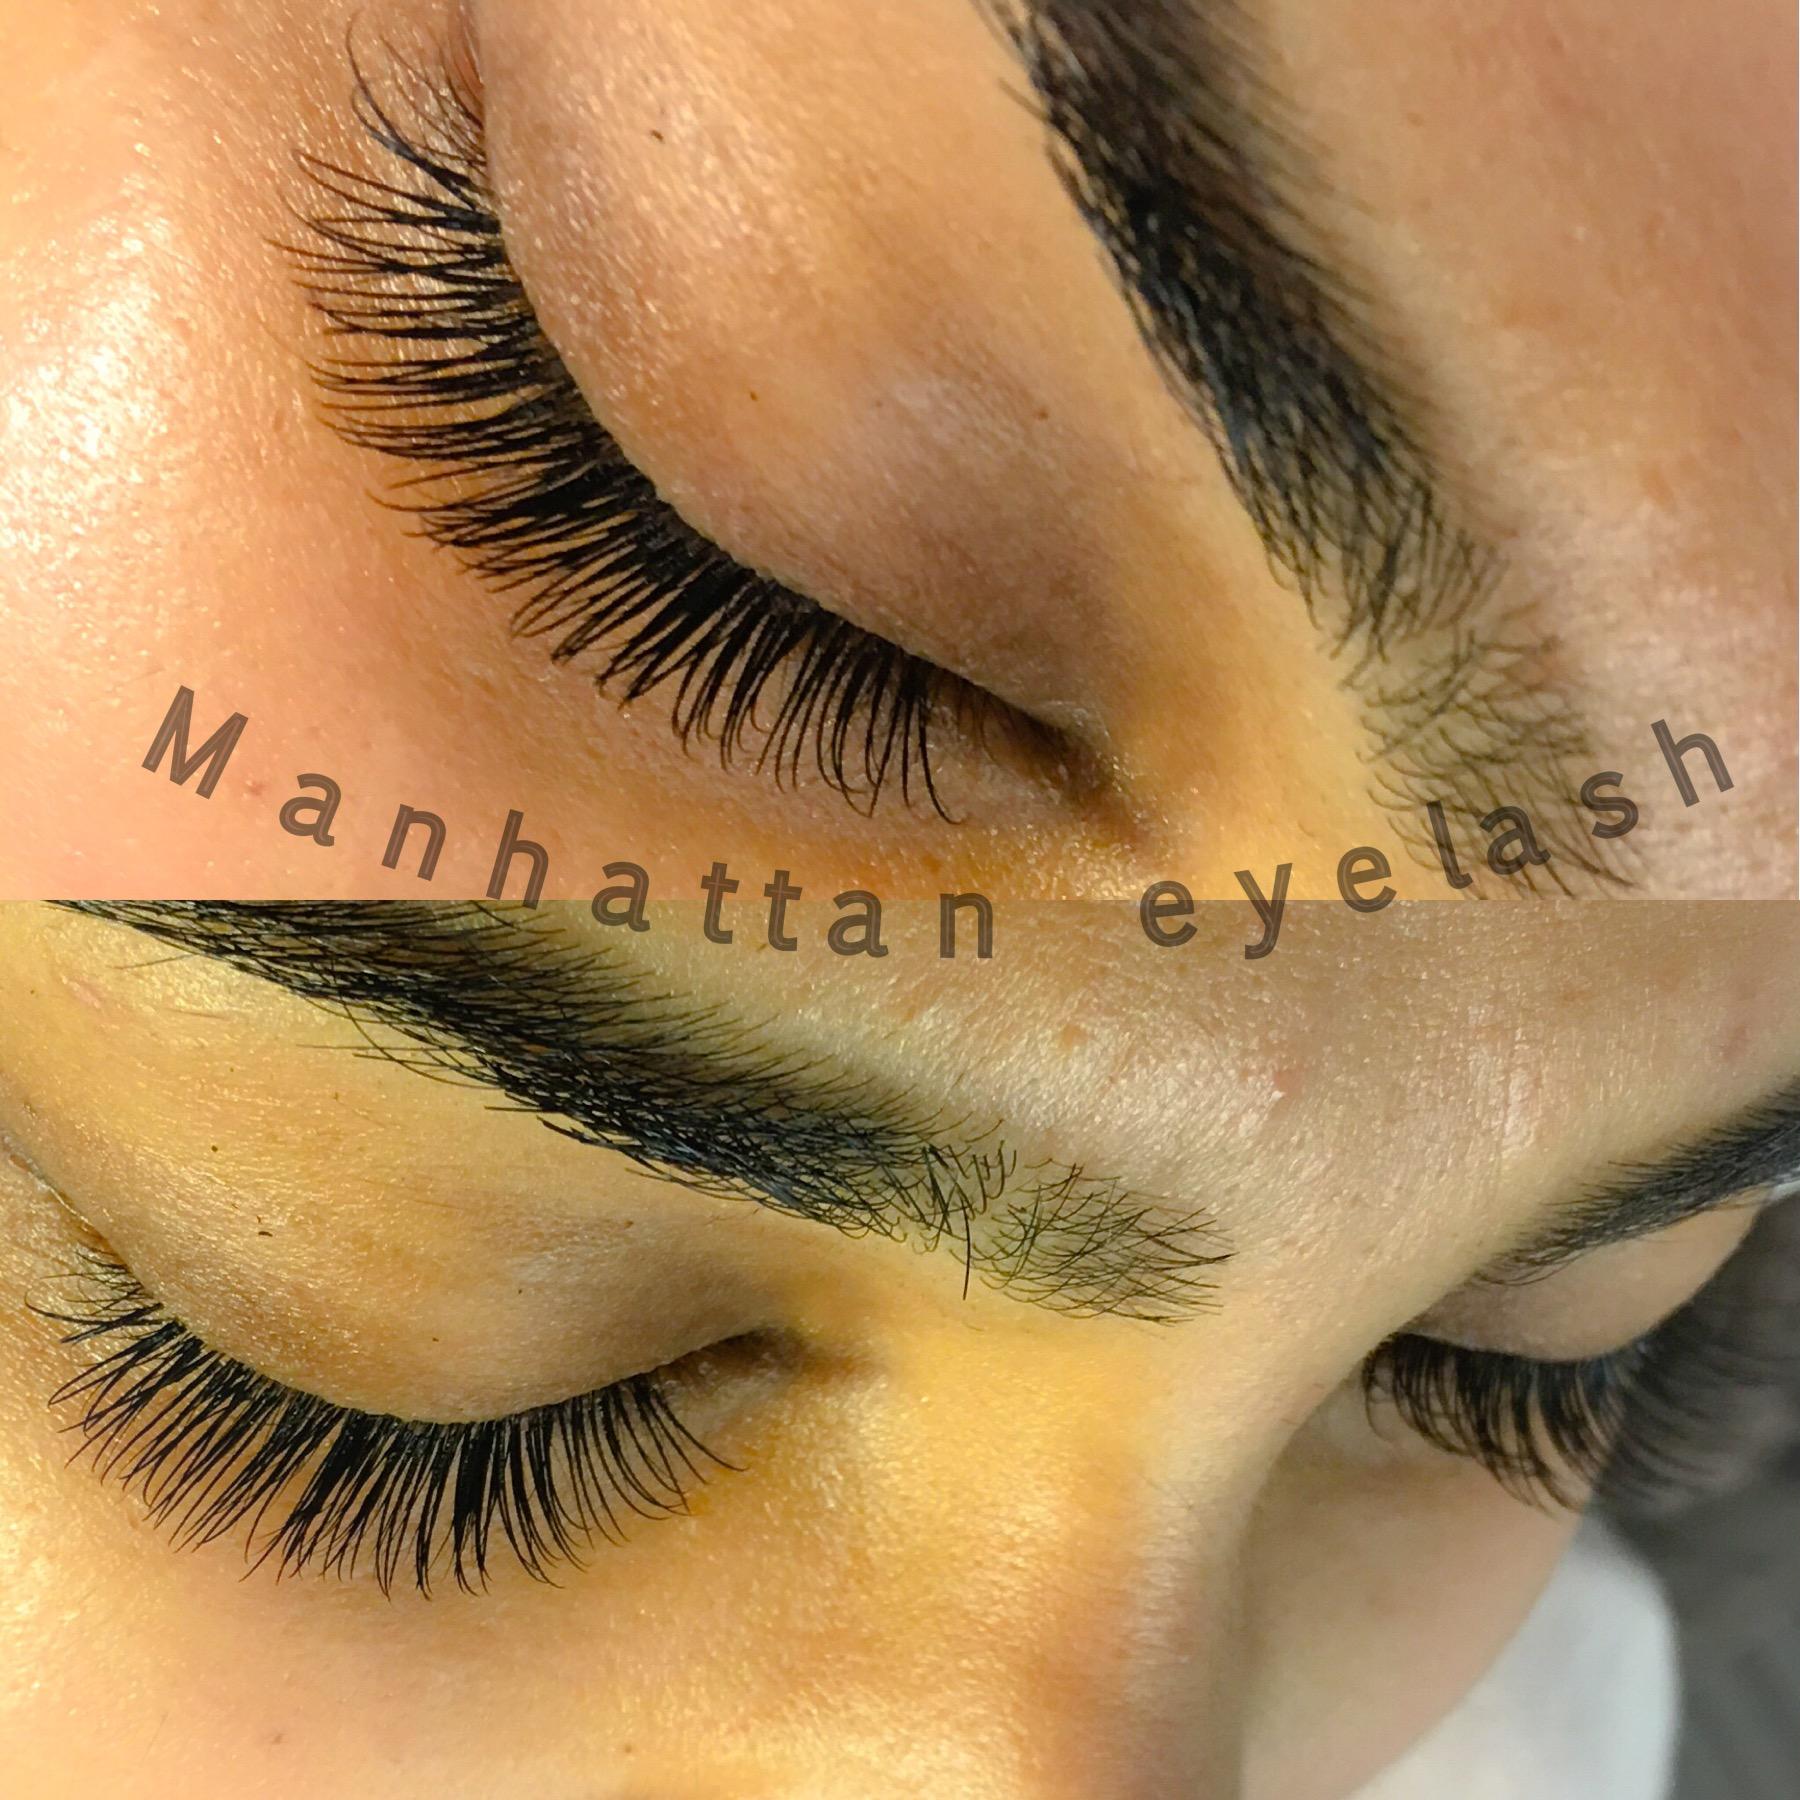 Classic Eyelash Extensions C-Curl 0.2mm